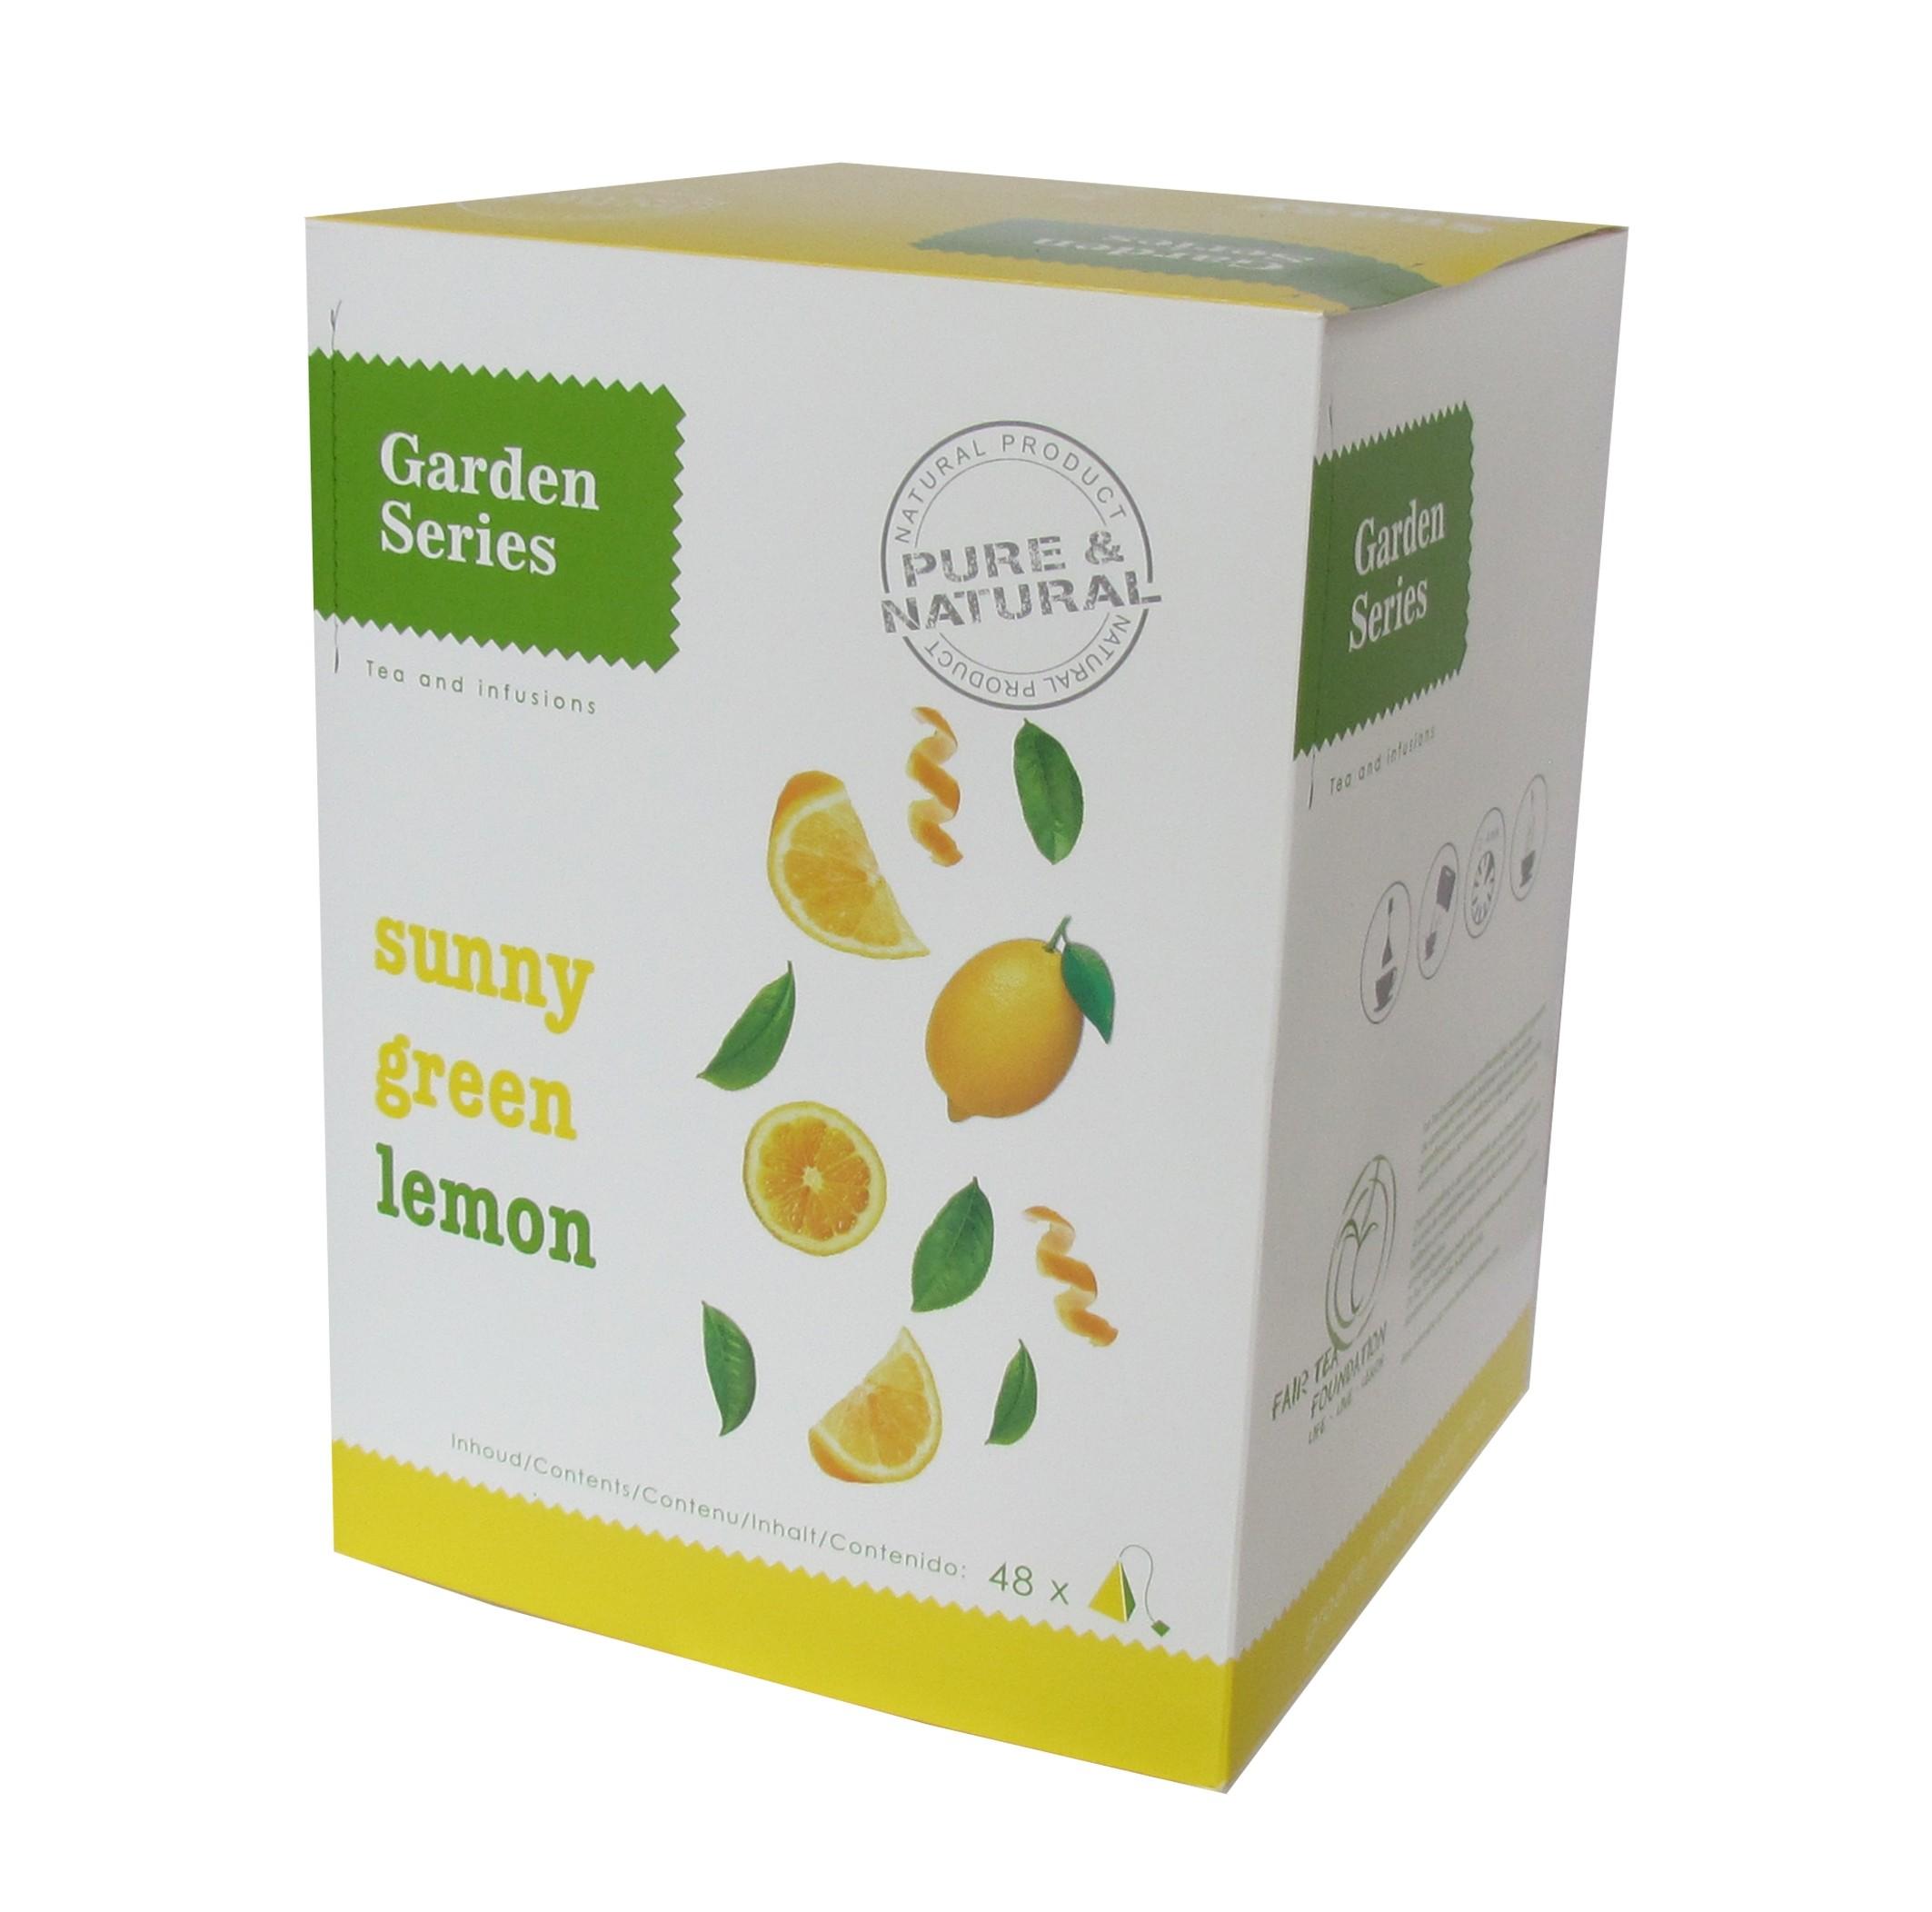 Garden serie Pyramide Sunny Green Lemon